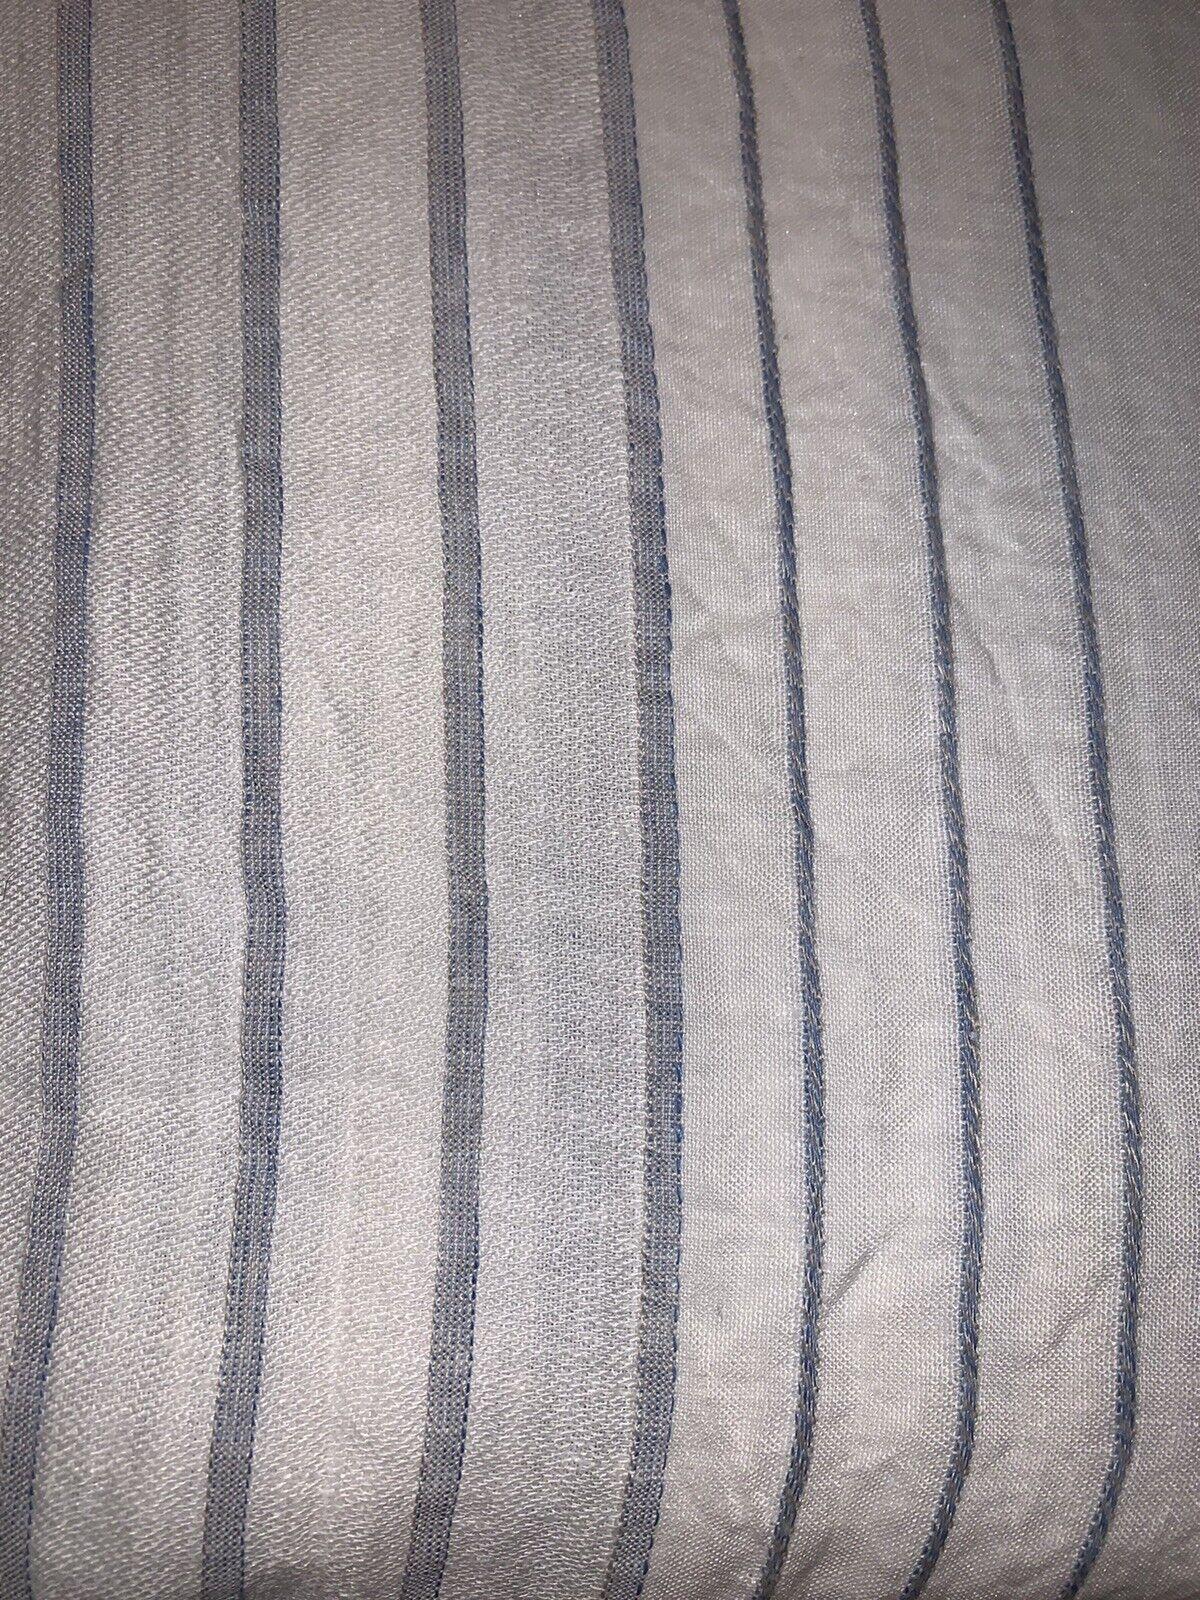 Restoration Hardware Italian Jacquard PACIFIC Stripe Linen Shower Curtain  - $69.00